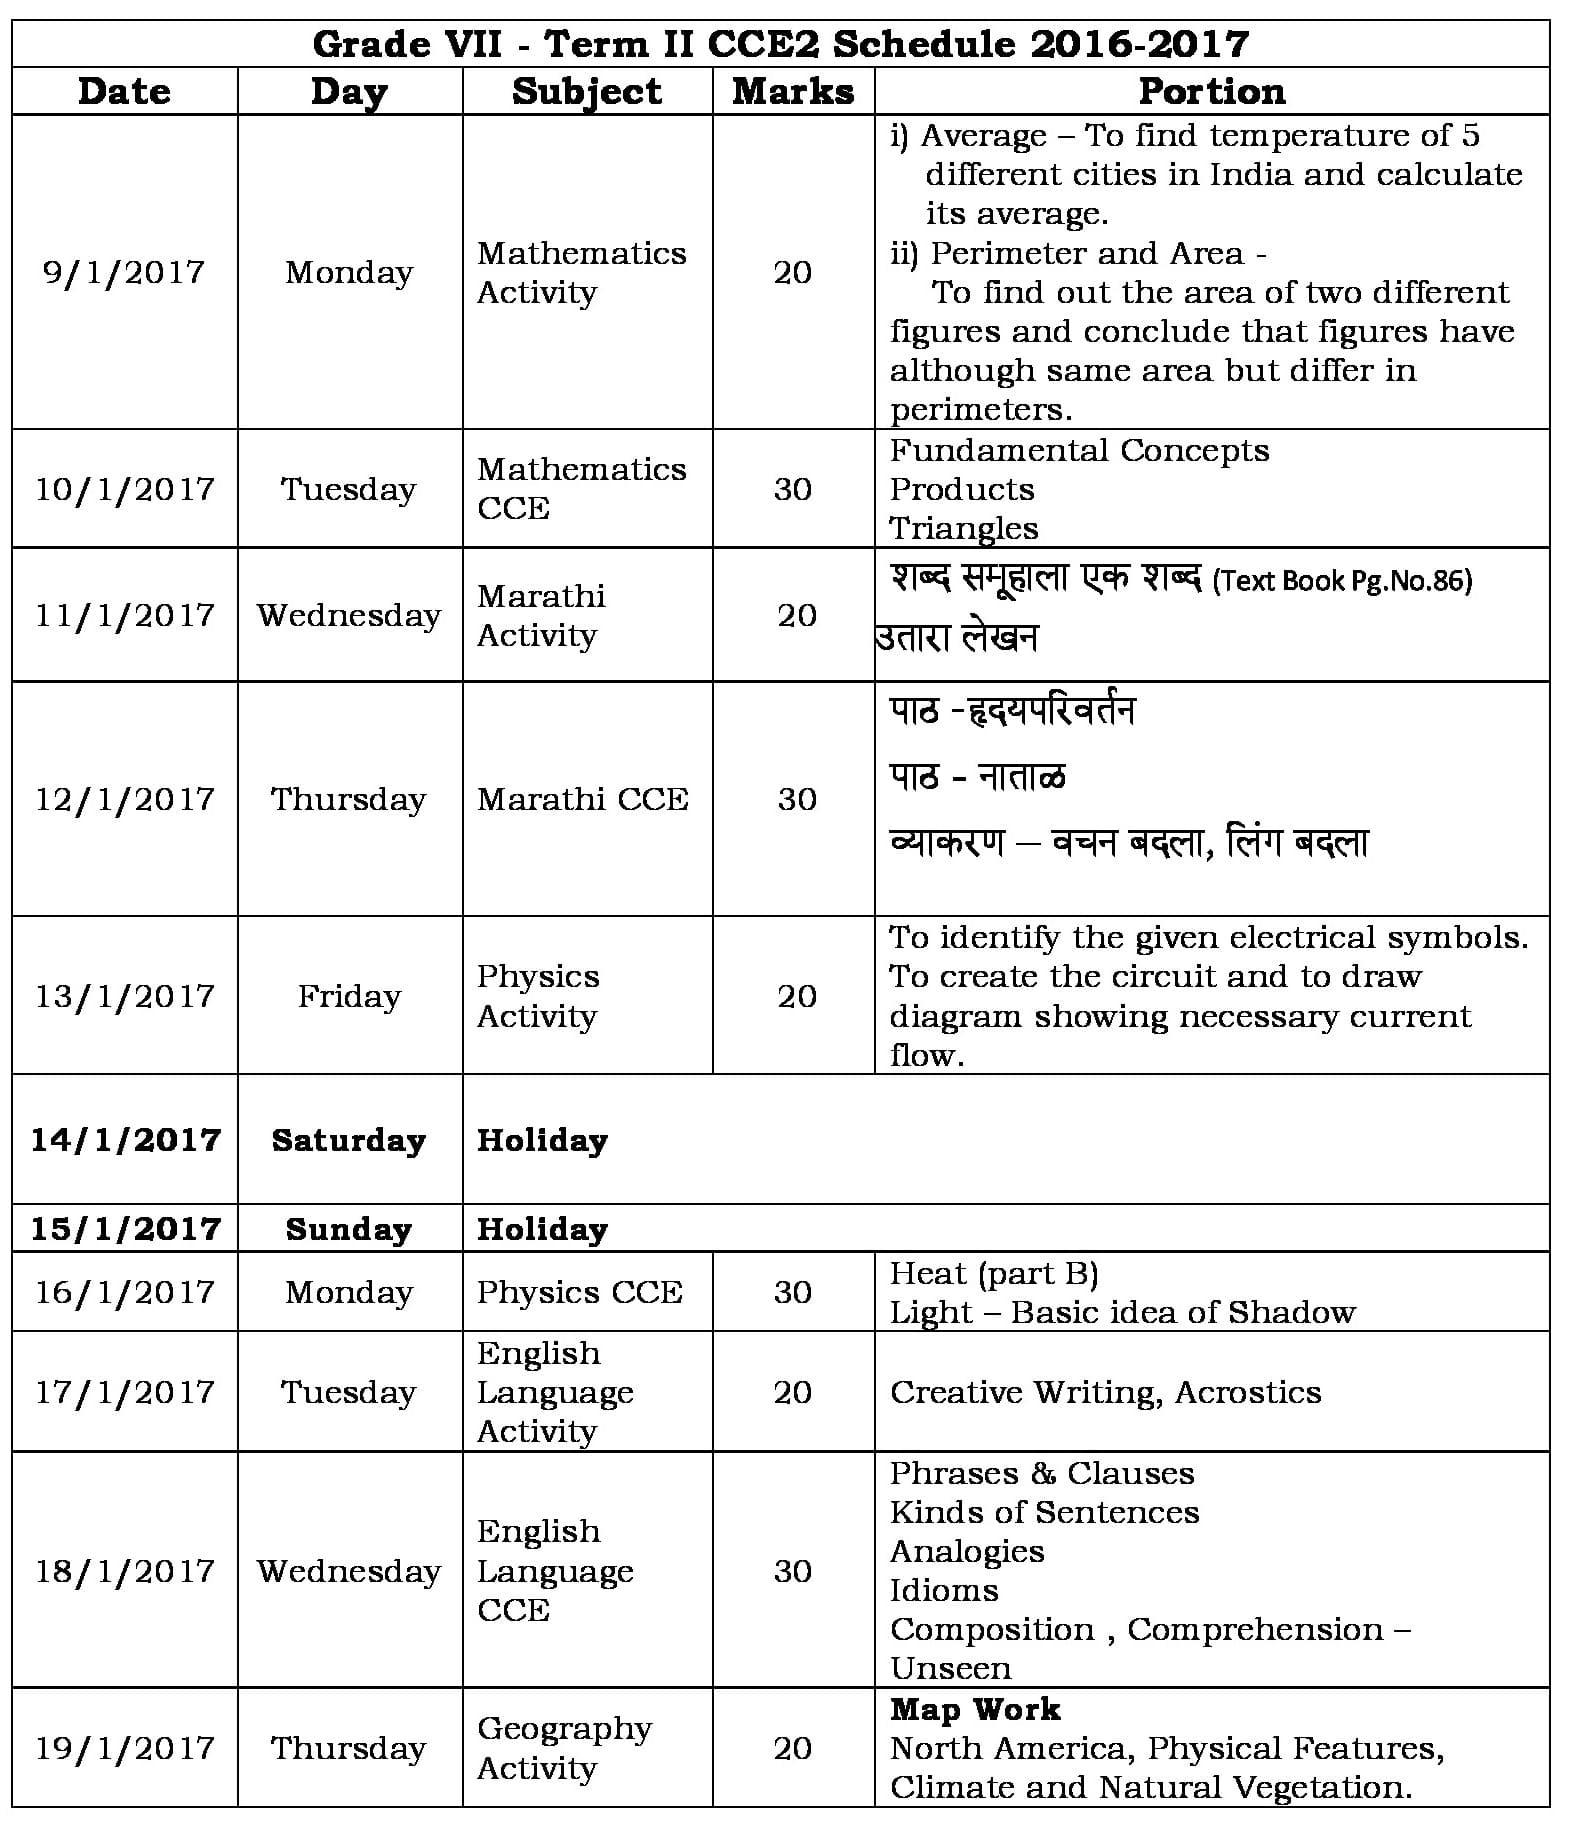 grade-vii-cce2-schedule-2016-17-0